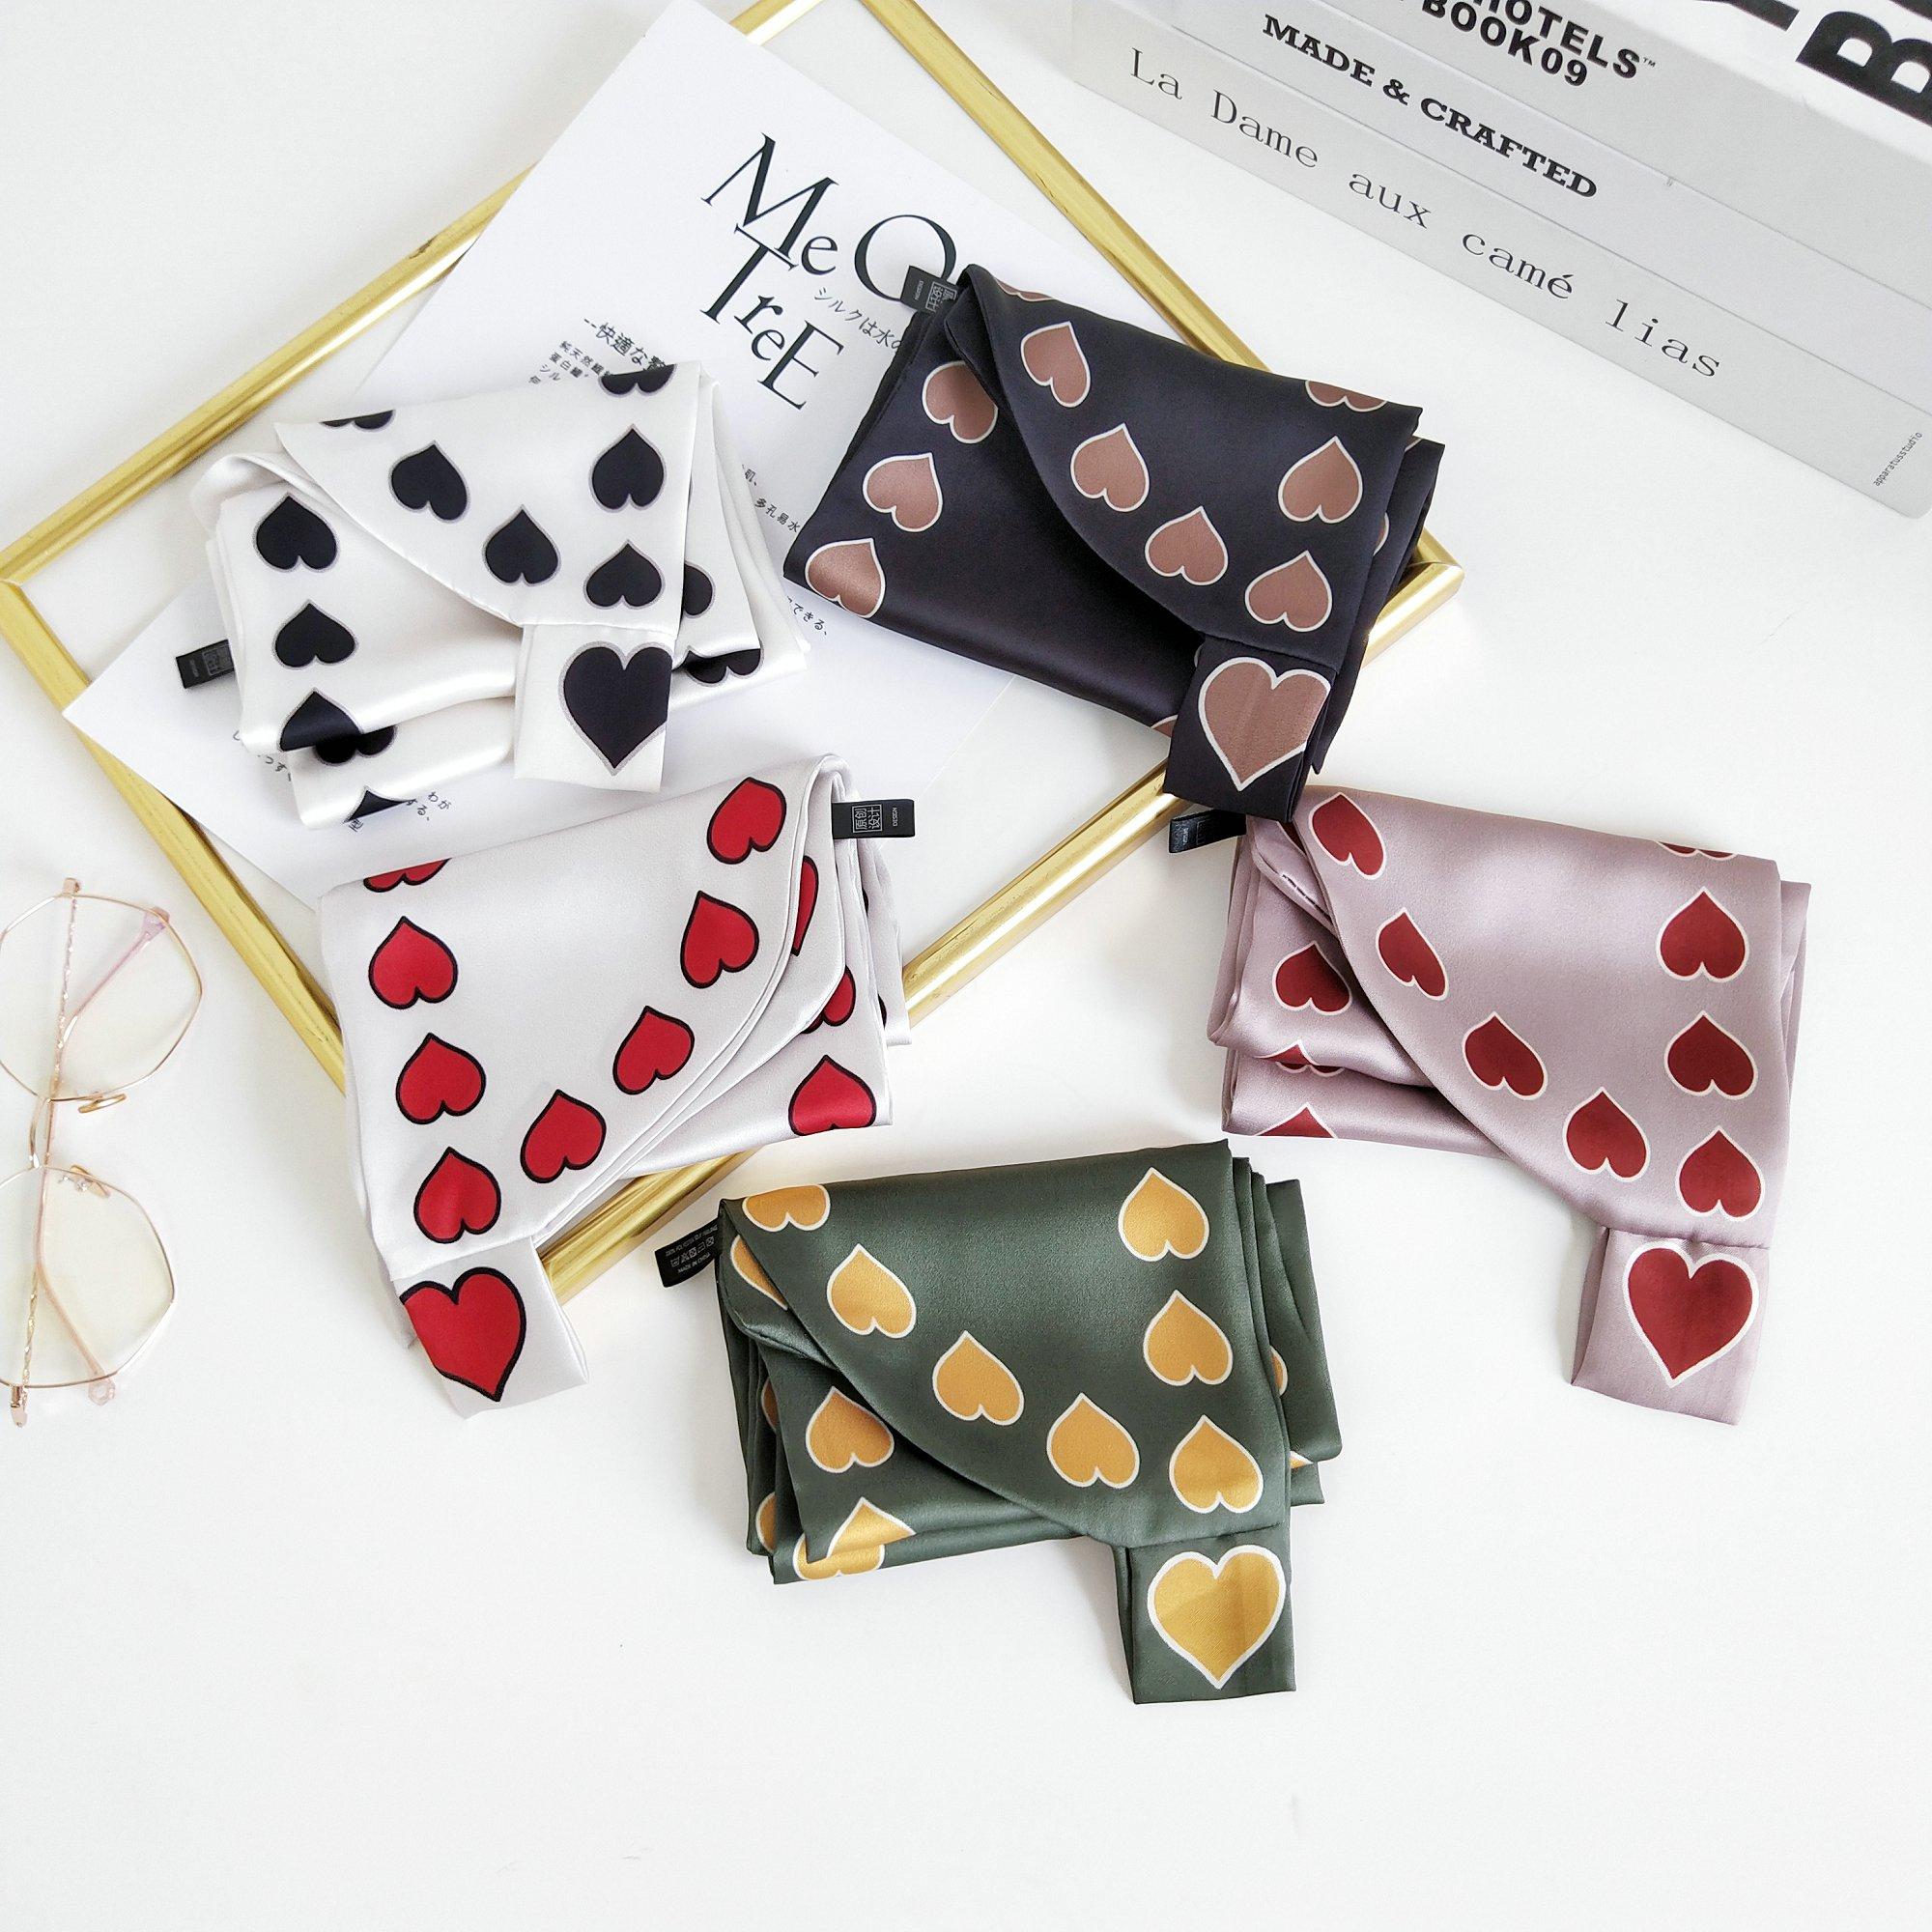 2020 Hot Korea Style Long Small Silk Scarf Decoration Small Neckerchief Simple Ear Variety Arm Ribbon Skinny Scarf